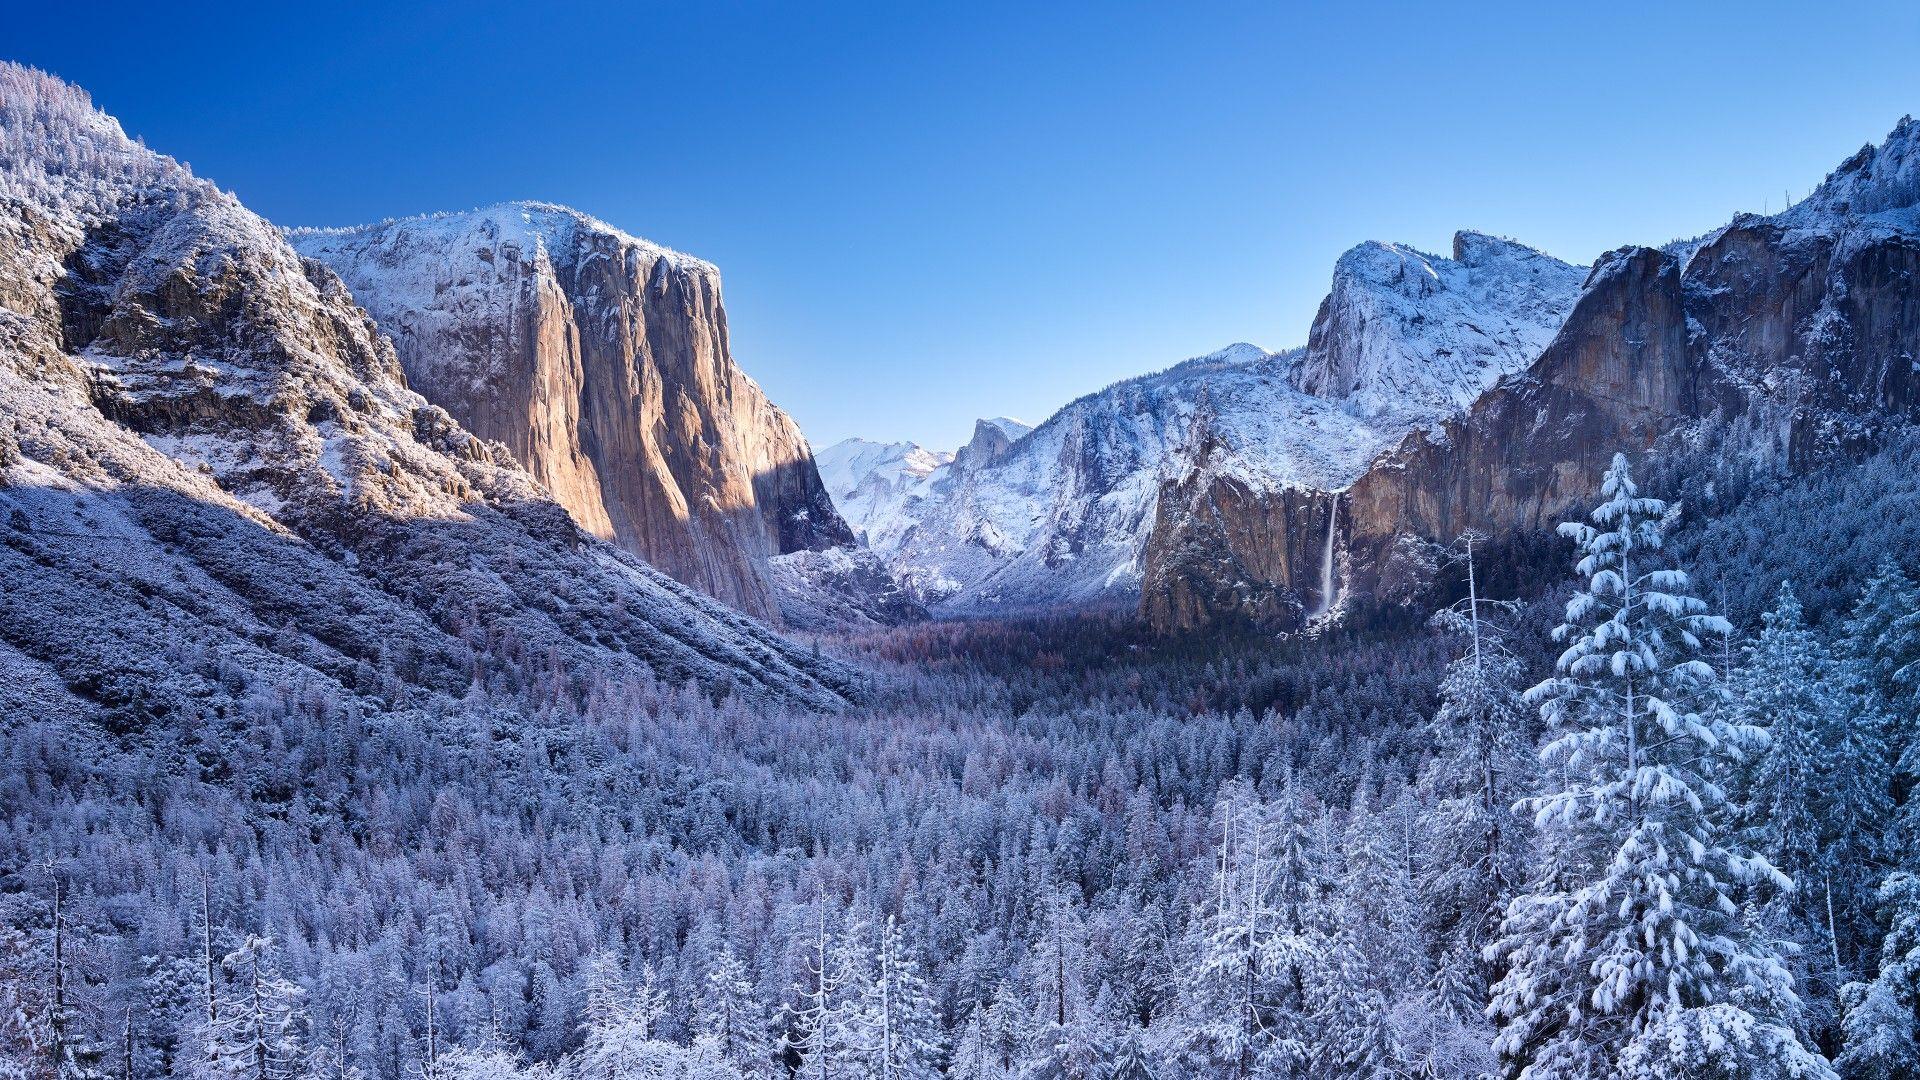 Yosemite National Park Winter[1920x1080] Need iPhone 6S